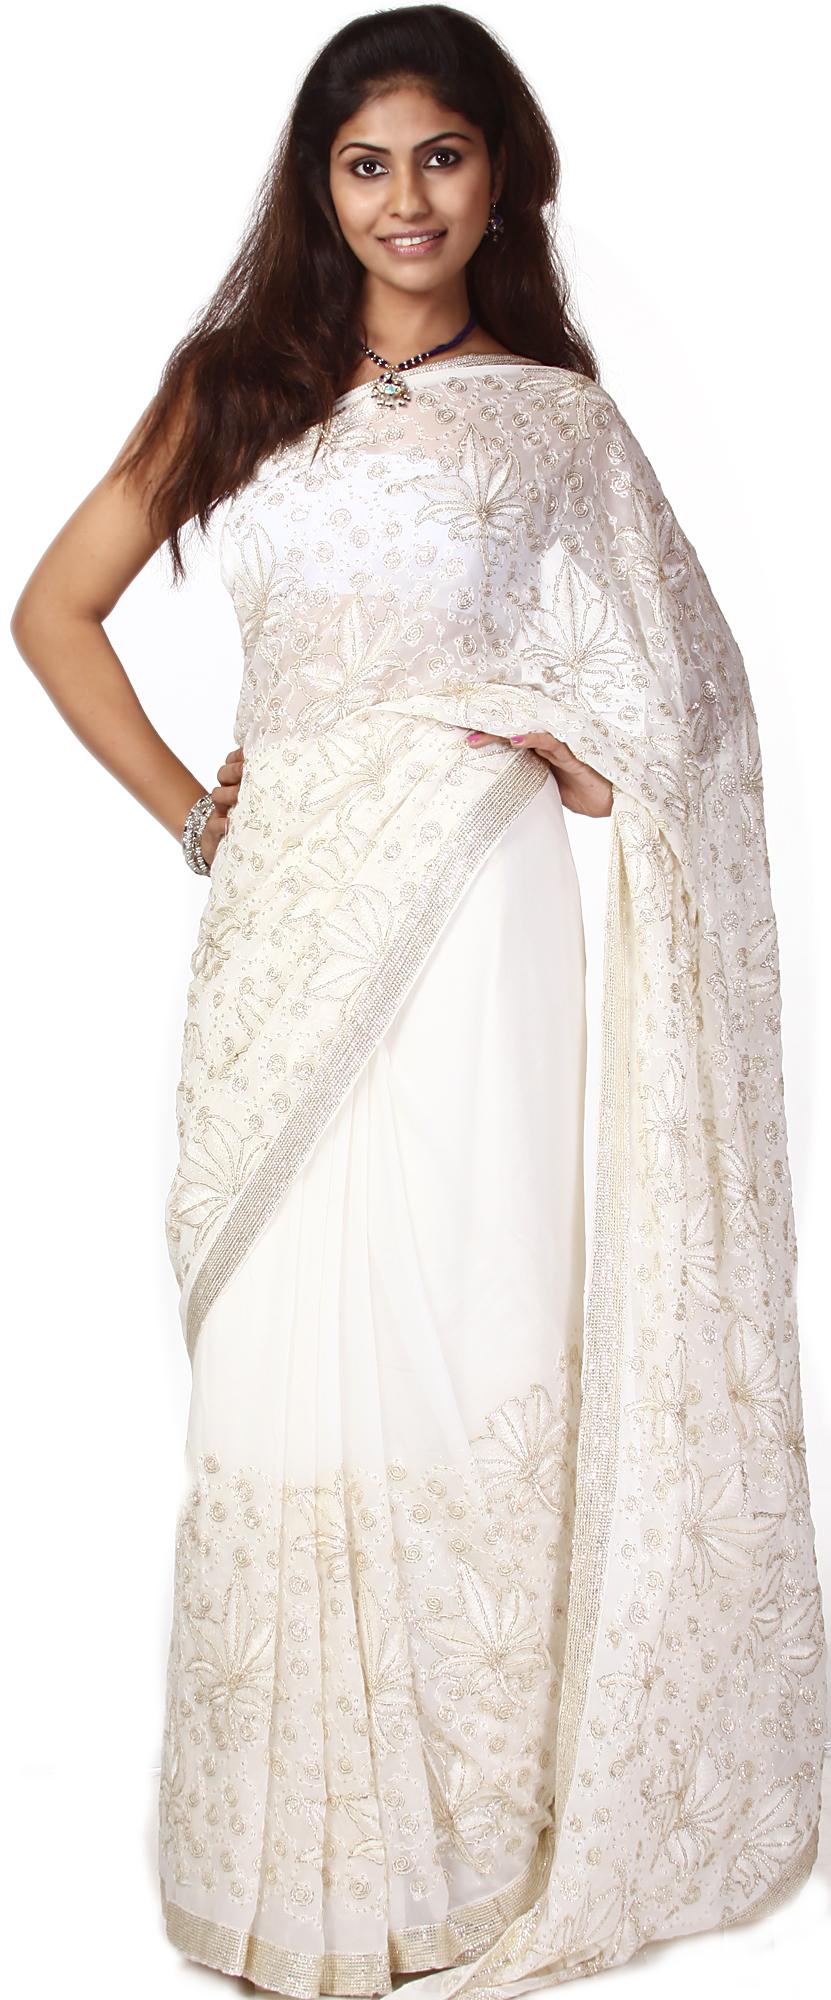 all white wedding dress kerala christian wedding Google Search Kerala Pinterest The o jays Search and Wedding